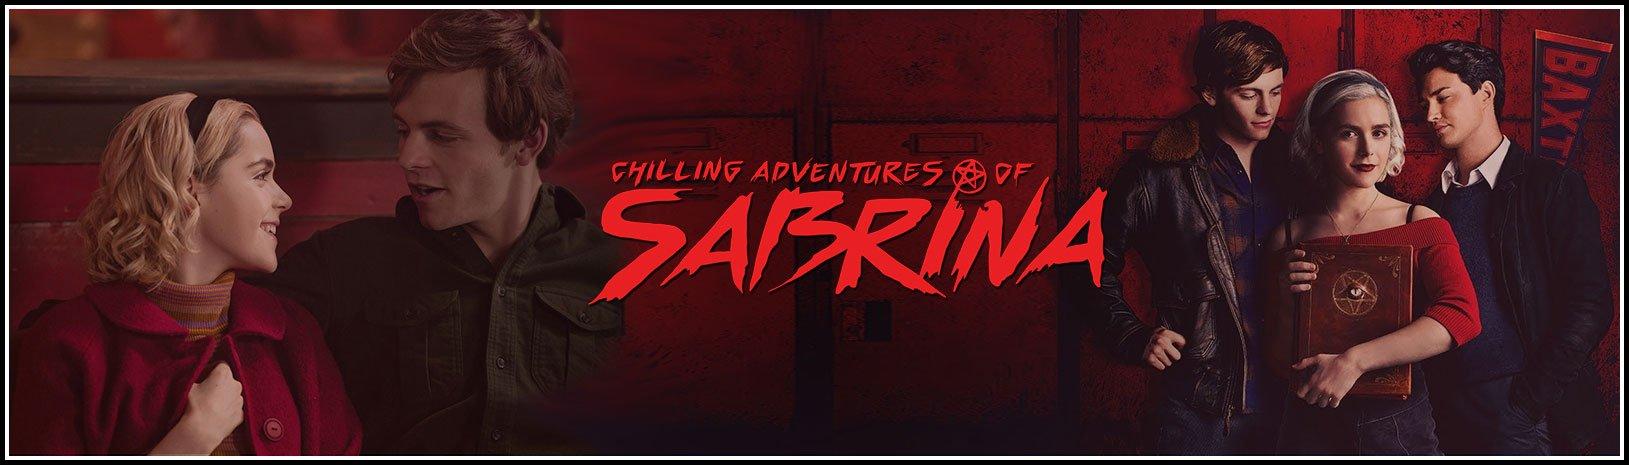 Chilling Adventures Of Sabrina Shop